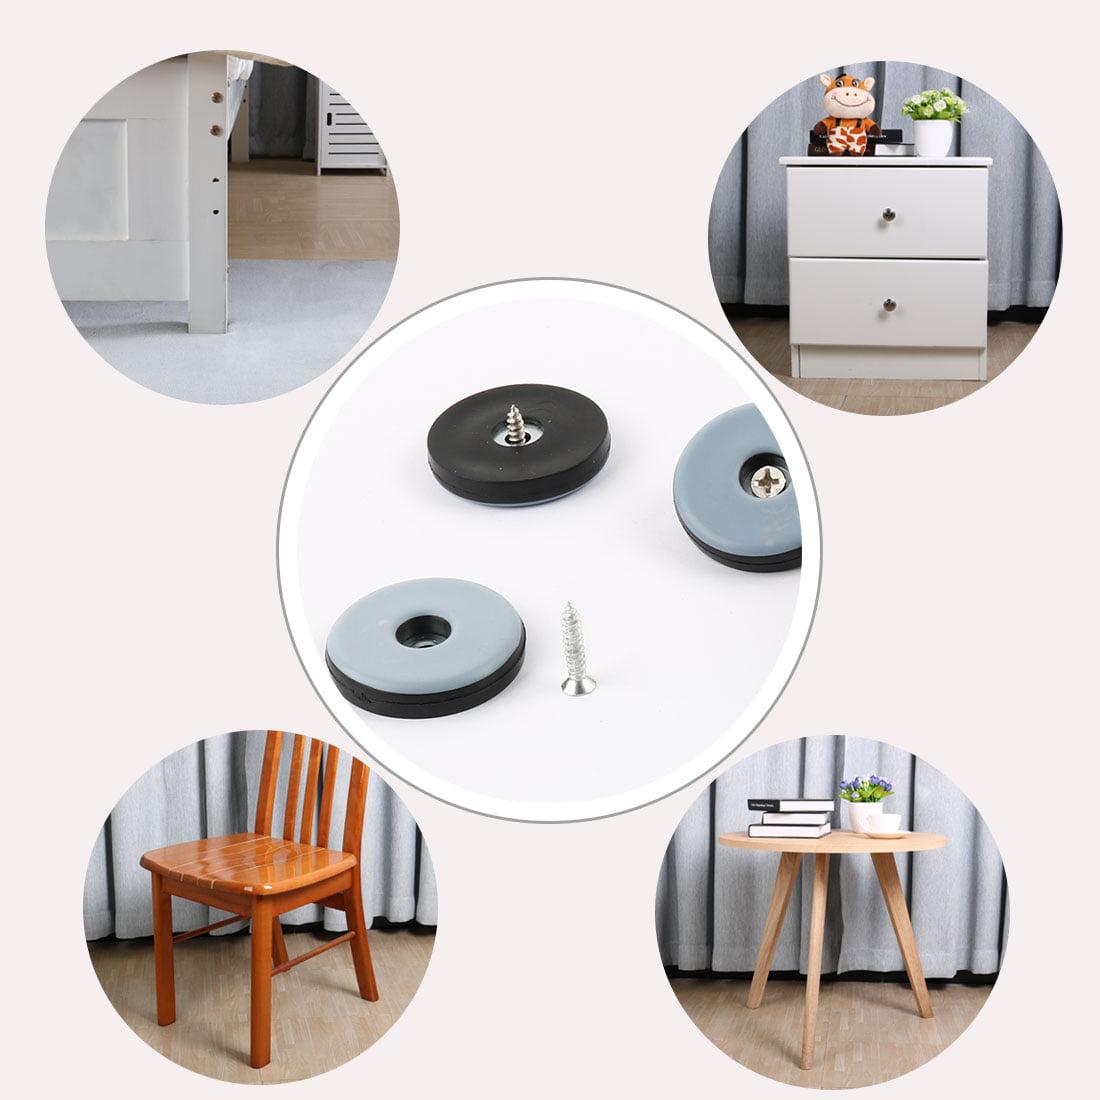 Stable Screw Furniture Slider Glides Chair Sofa Foot Mover Light Blue 4pcs - image 2 de 5